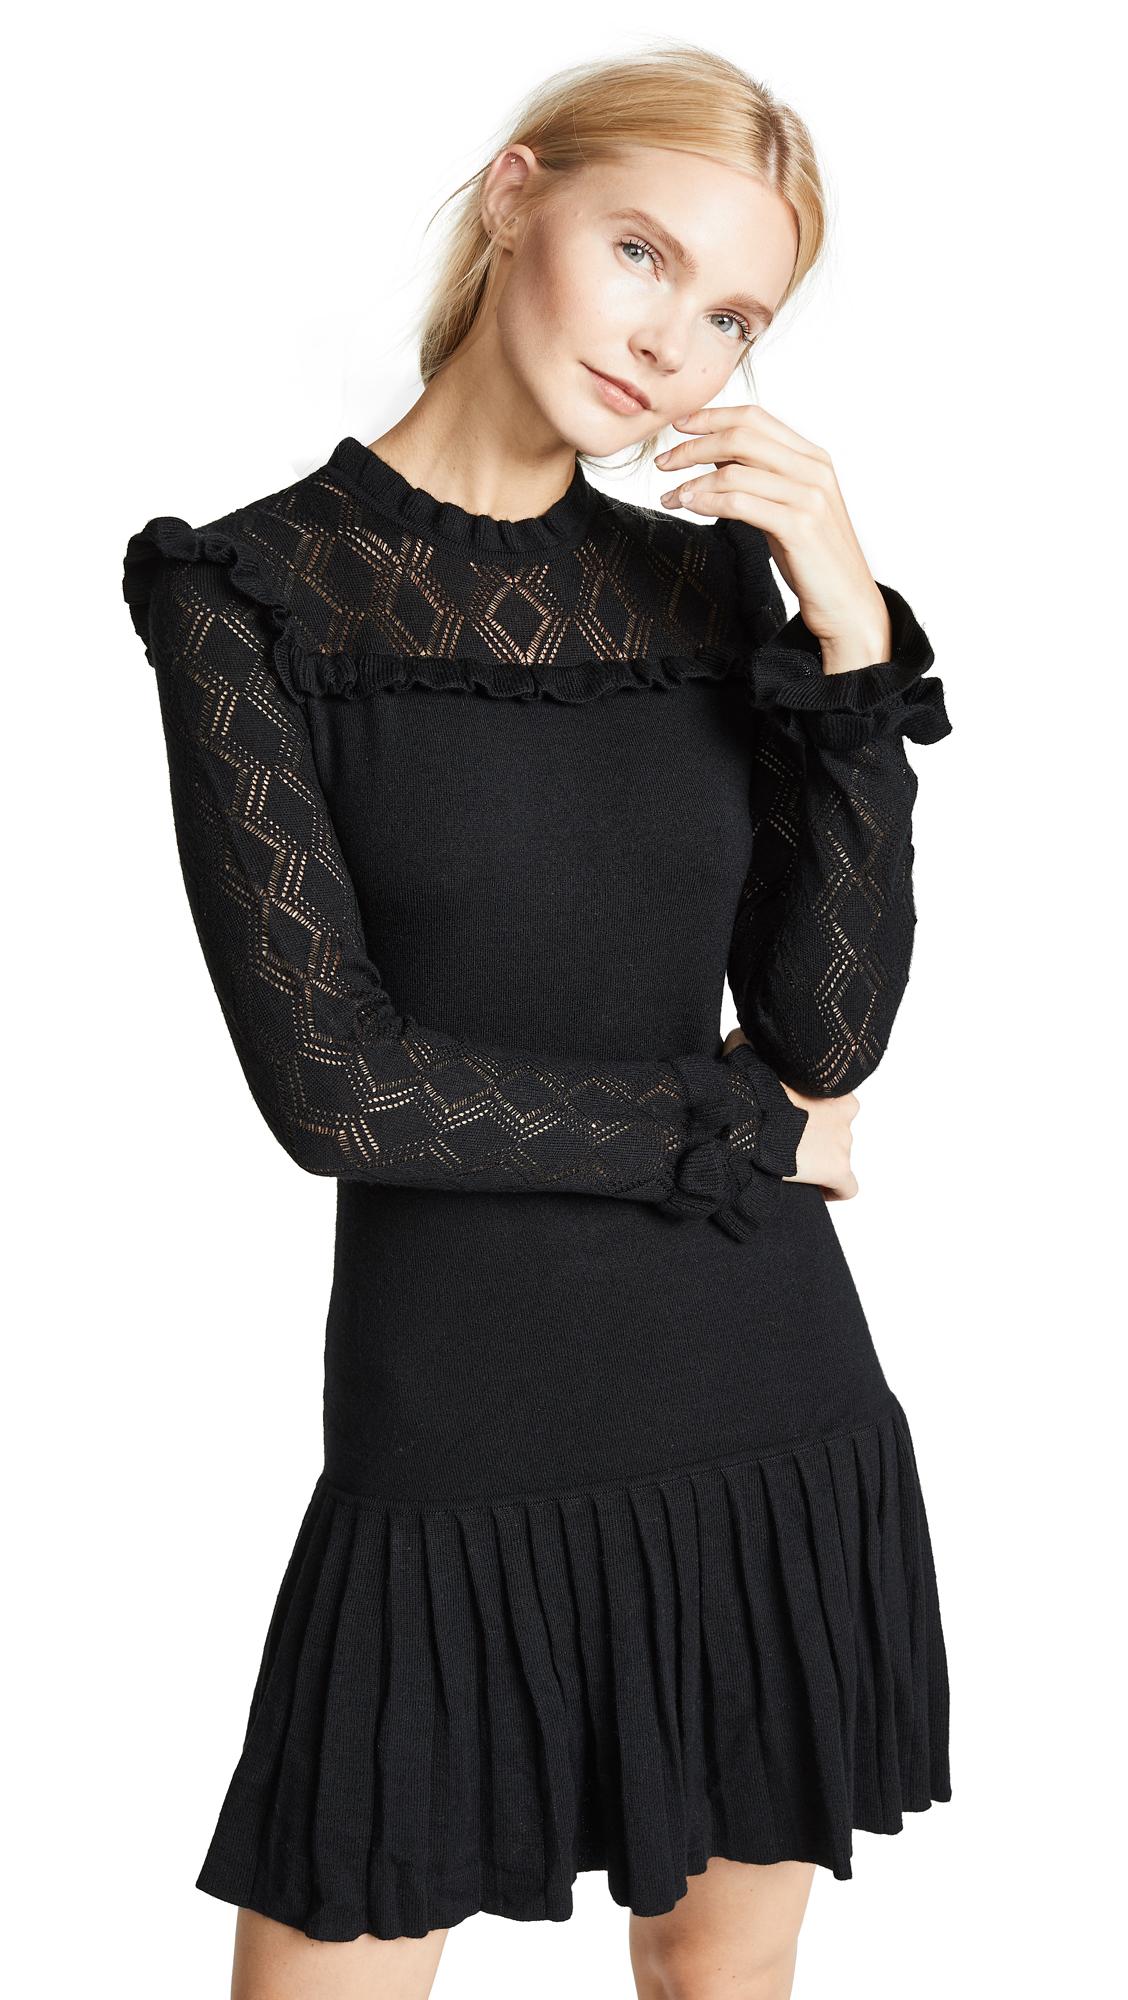 bc7c552ce1 Shoshanna Nicolla Dress